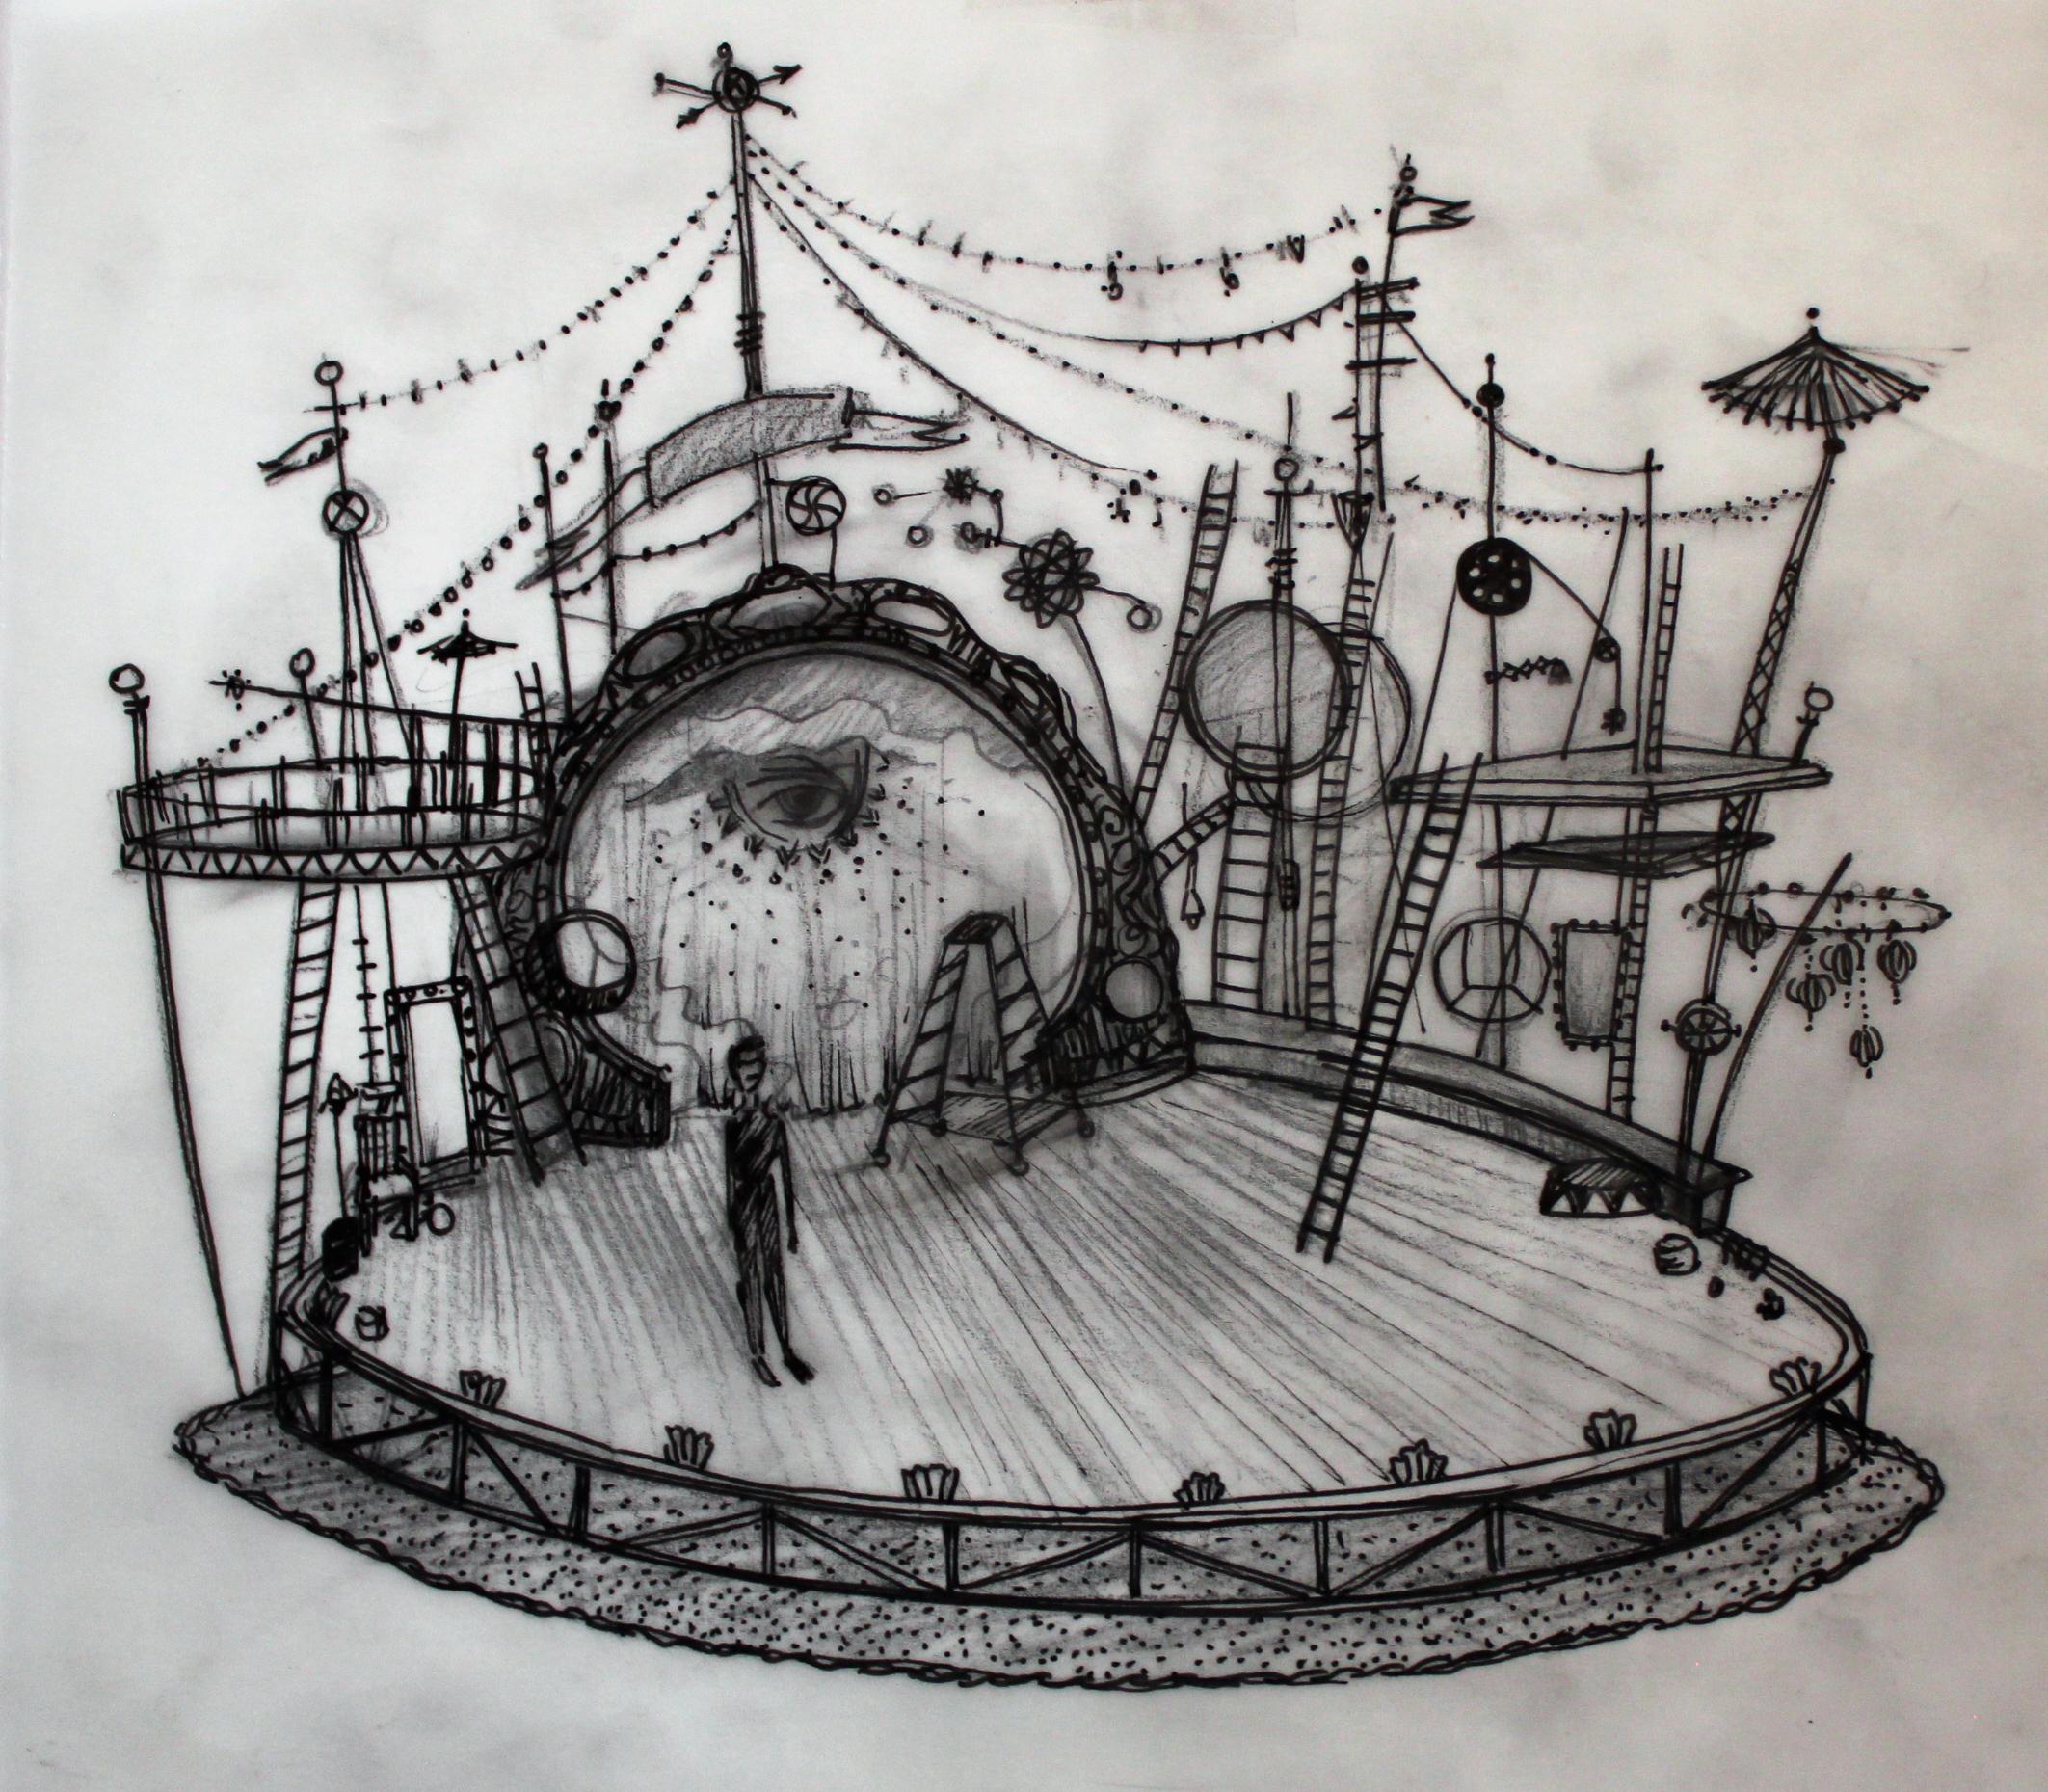 Set Design for a Live Performance_WORK_The Tempest_Charlotte Lane_Production Process_Image 3.JPG